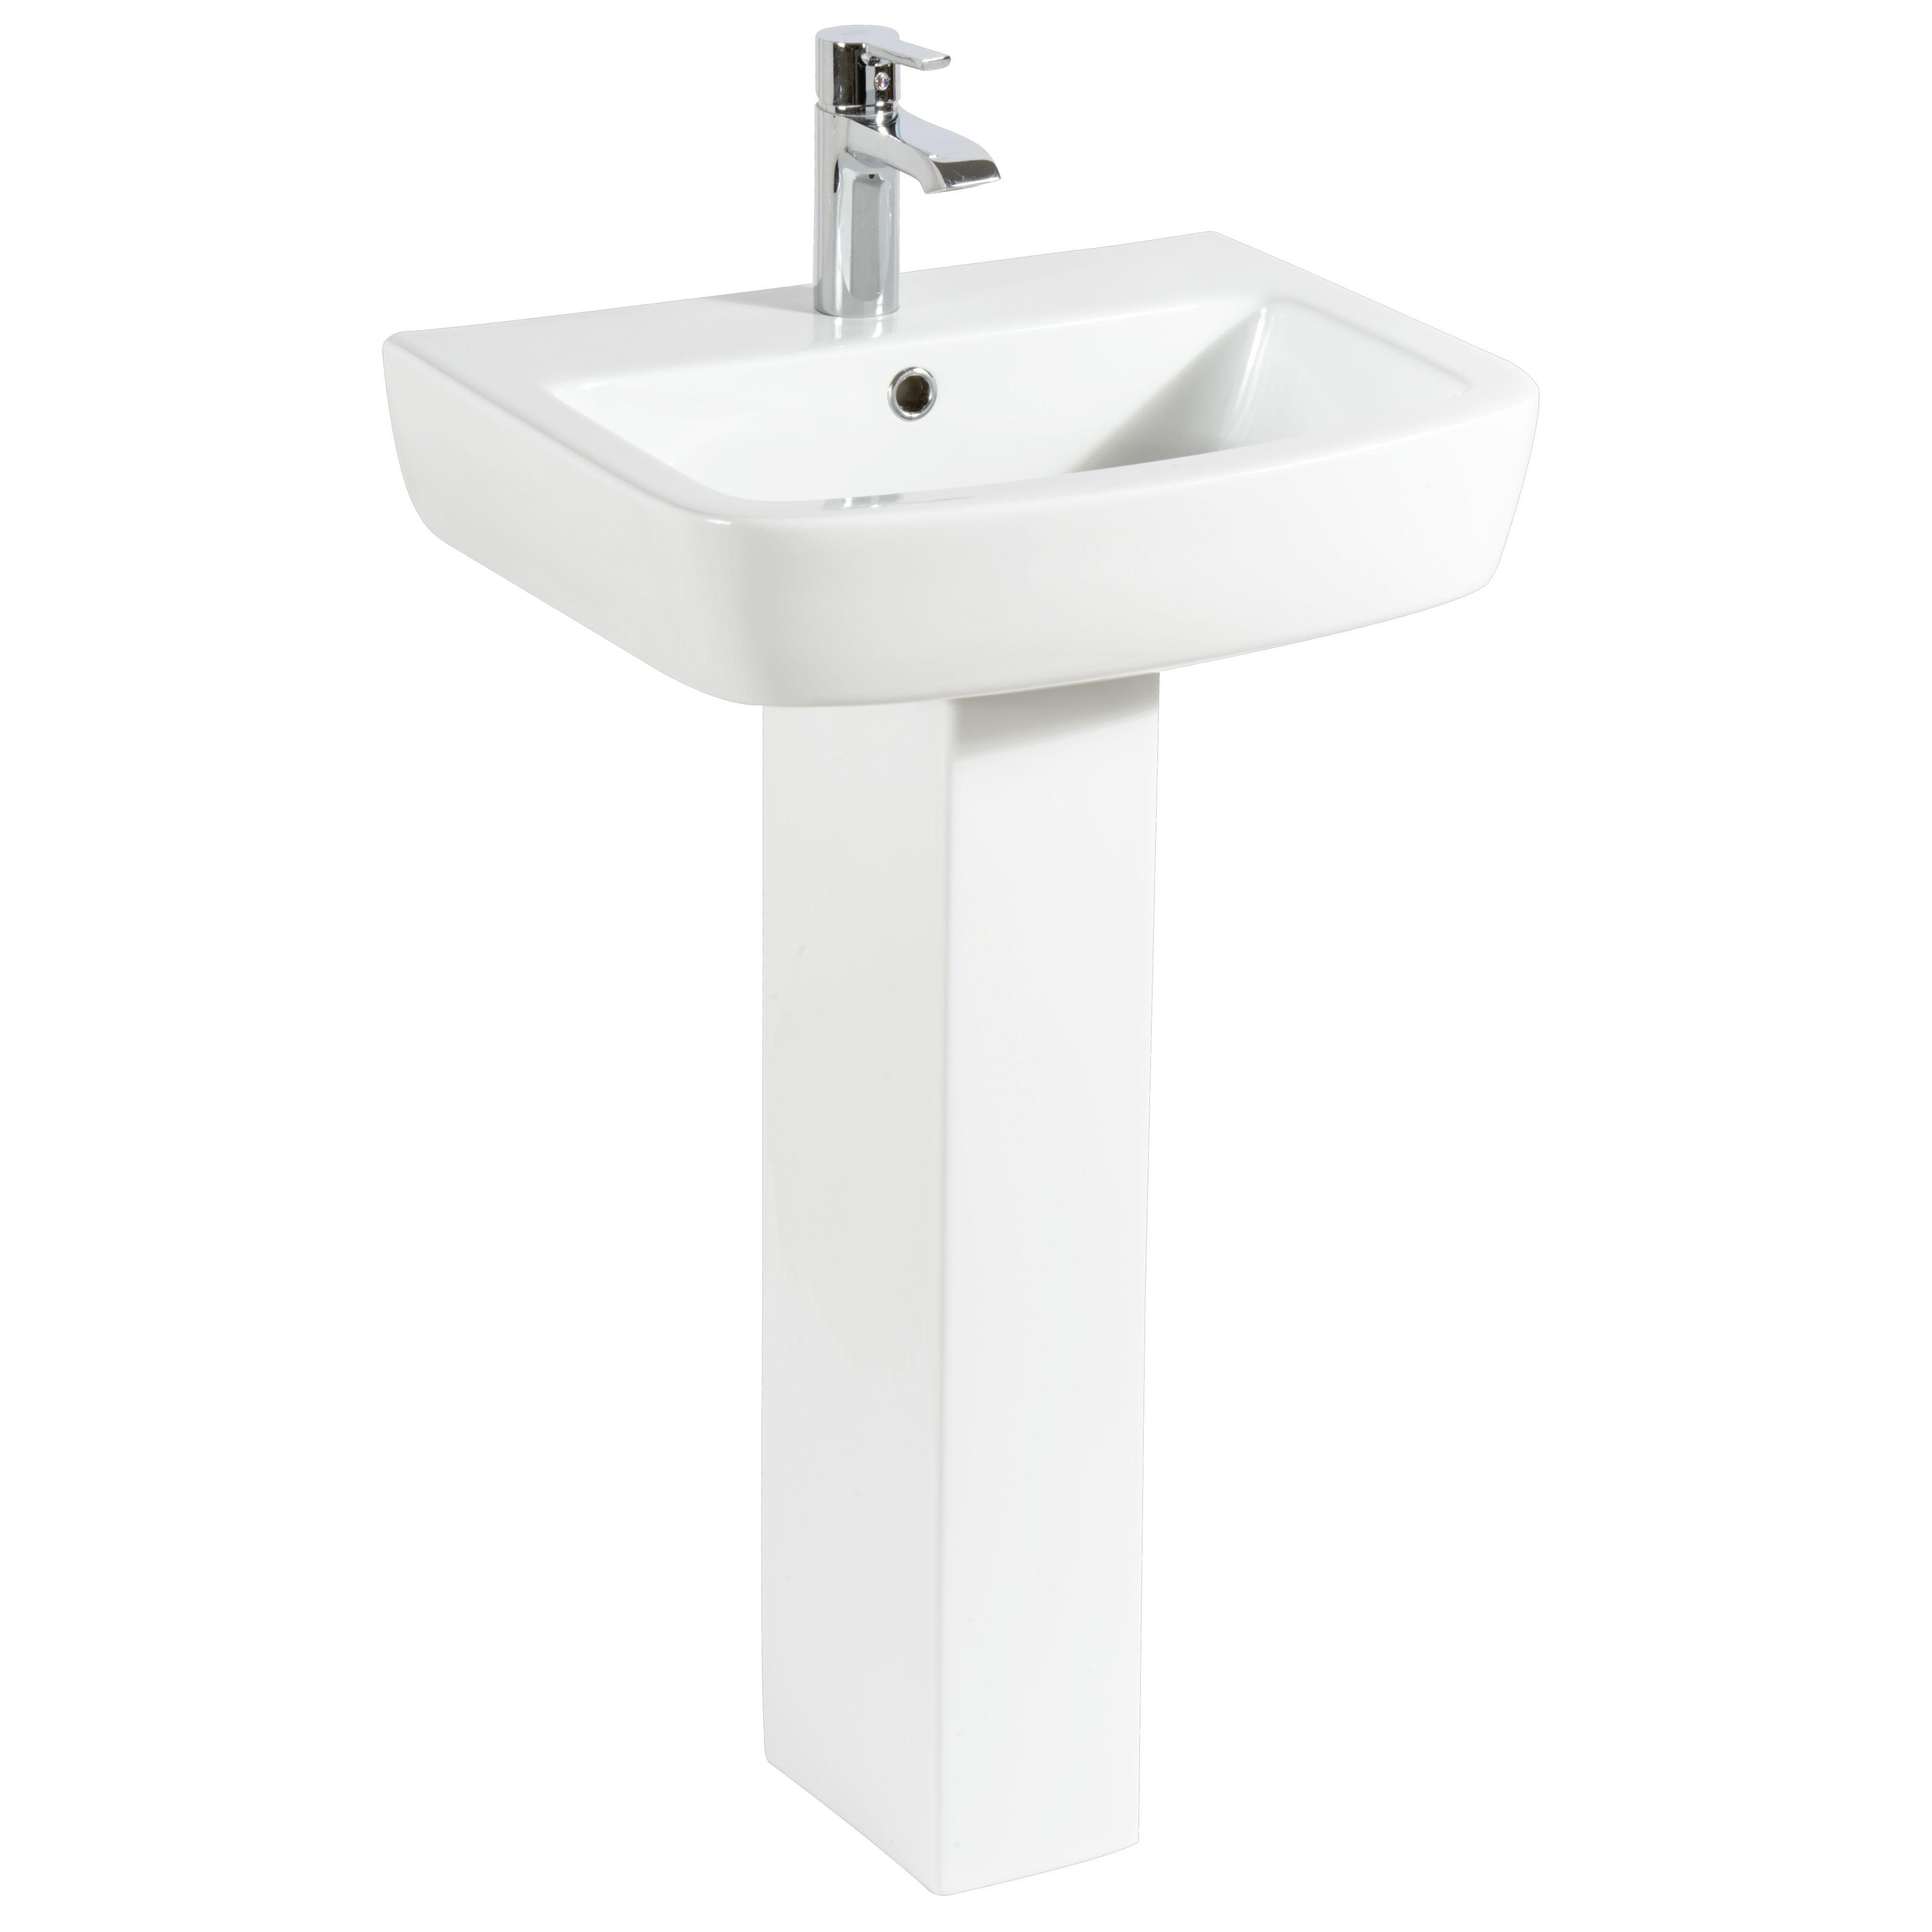 Pedestal Basin : Cooke & Lewis Fabienne Rectangular Full Pedestal Basin